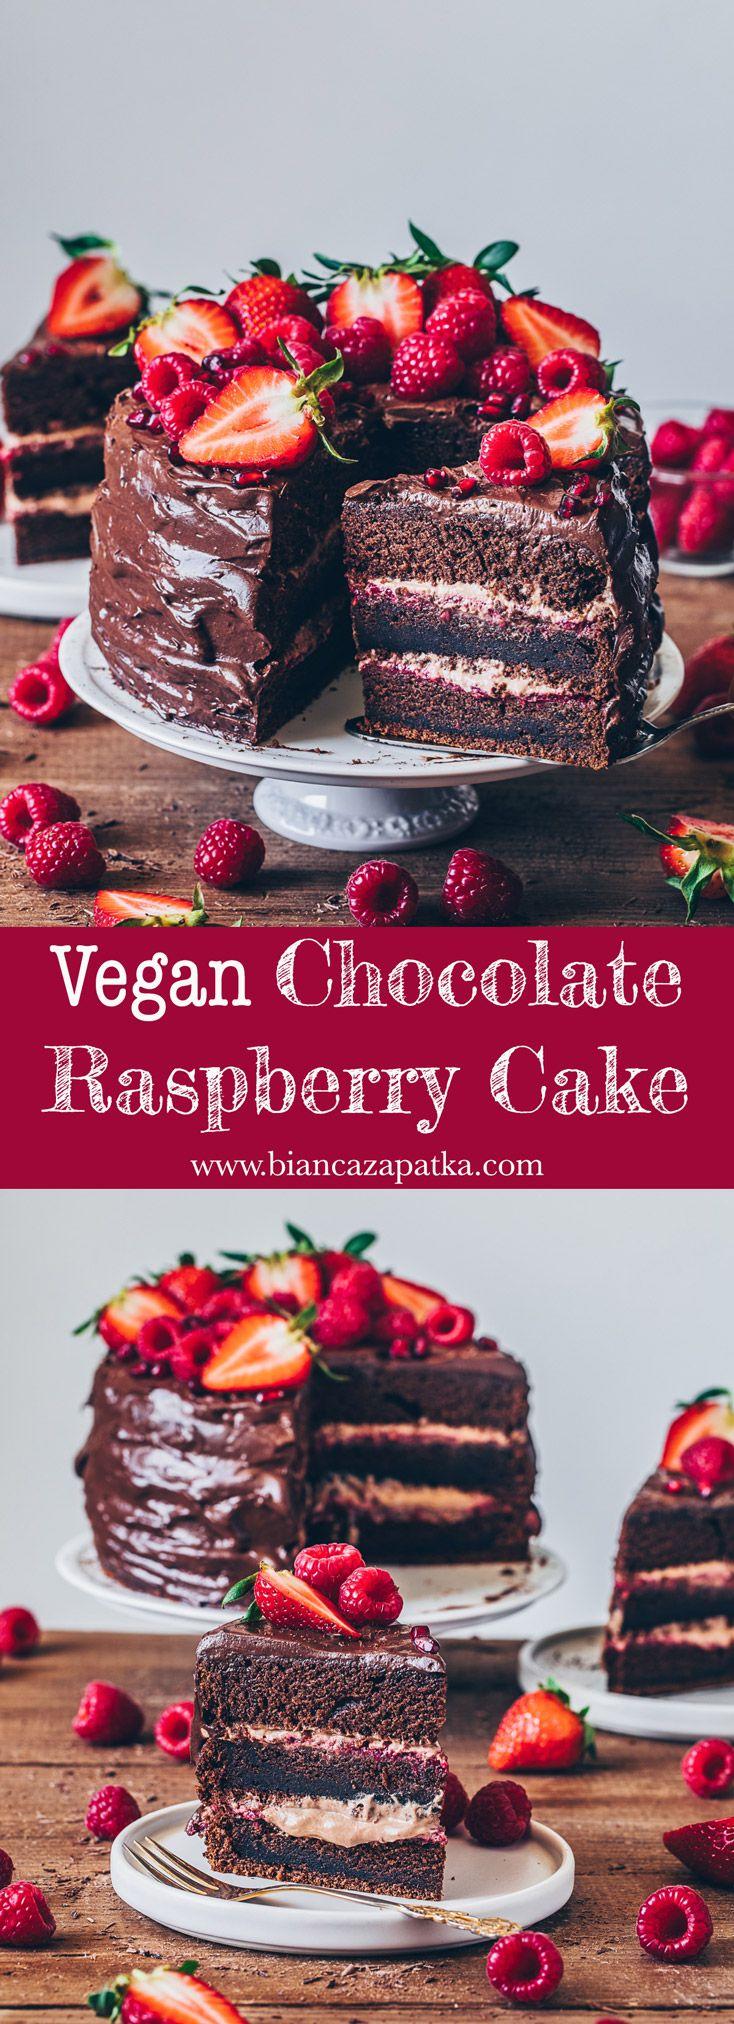 Chocolate Raspberry Cake - Vegan - Bianca Zapatka | Recipes